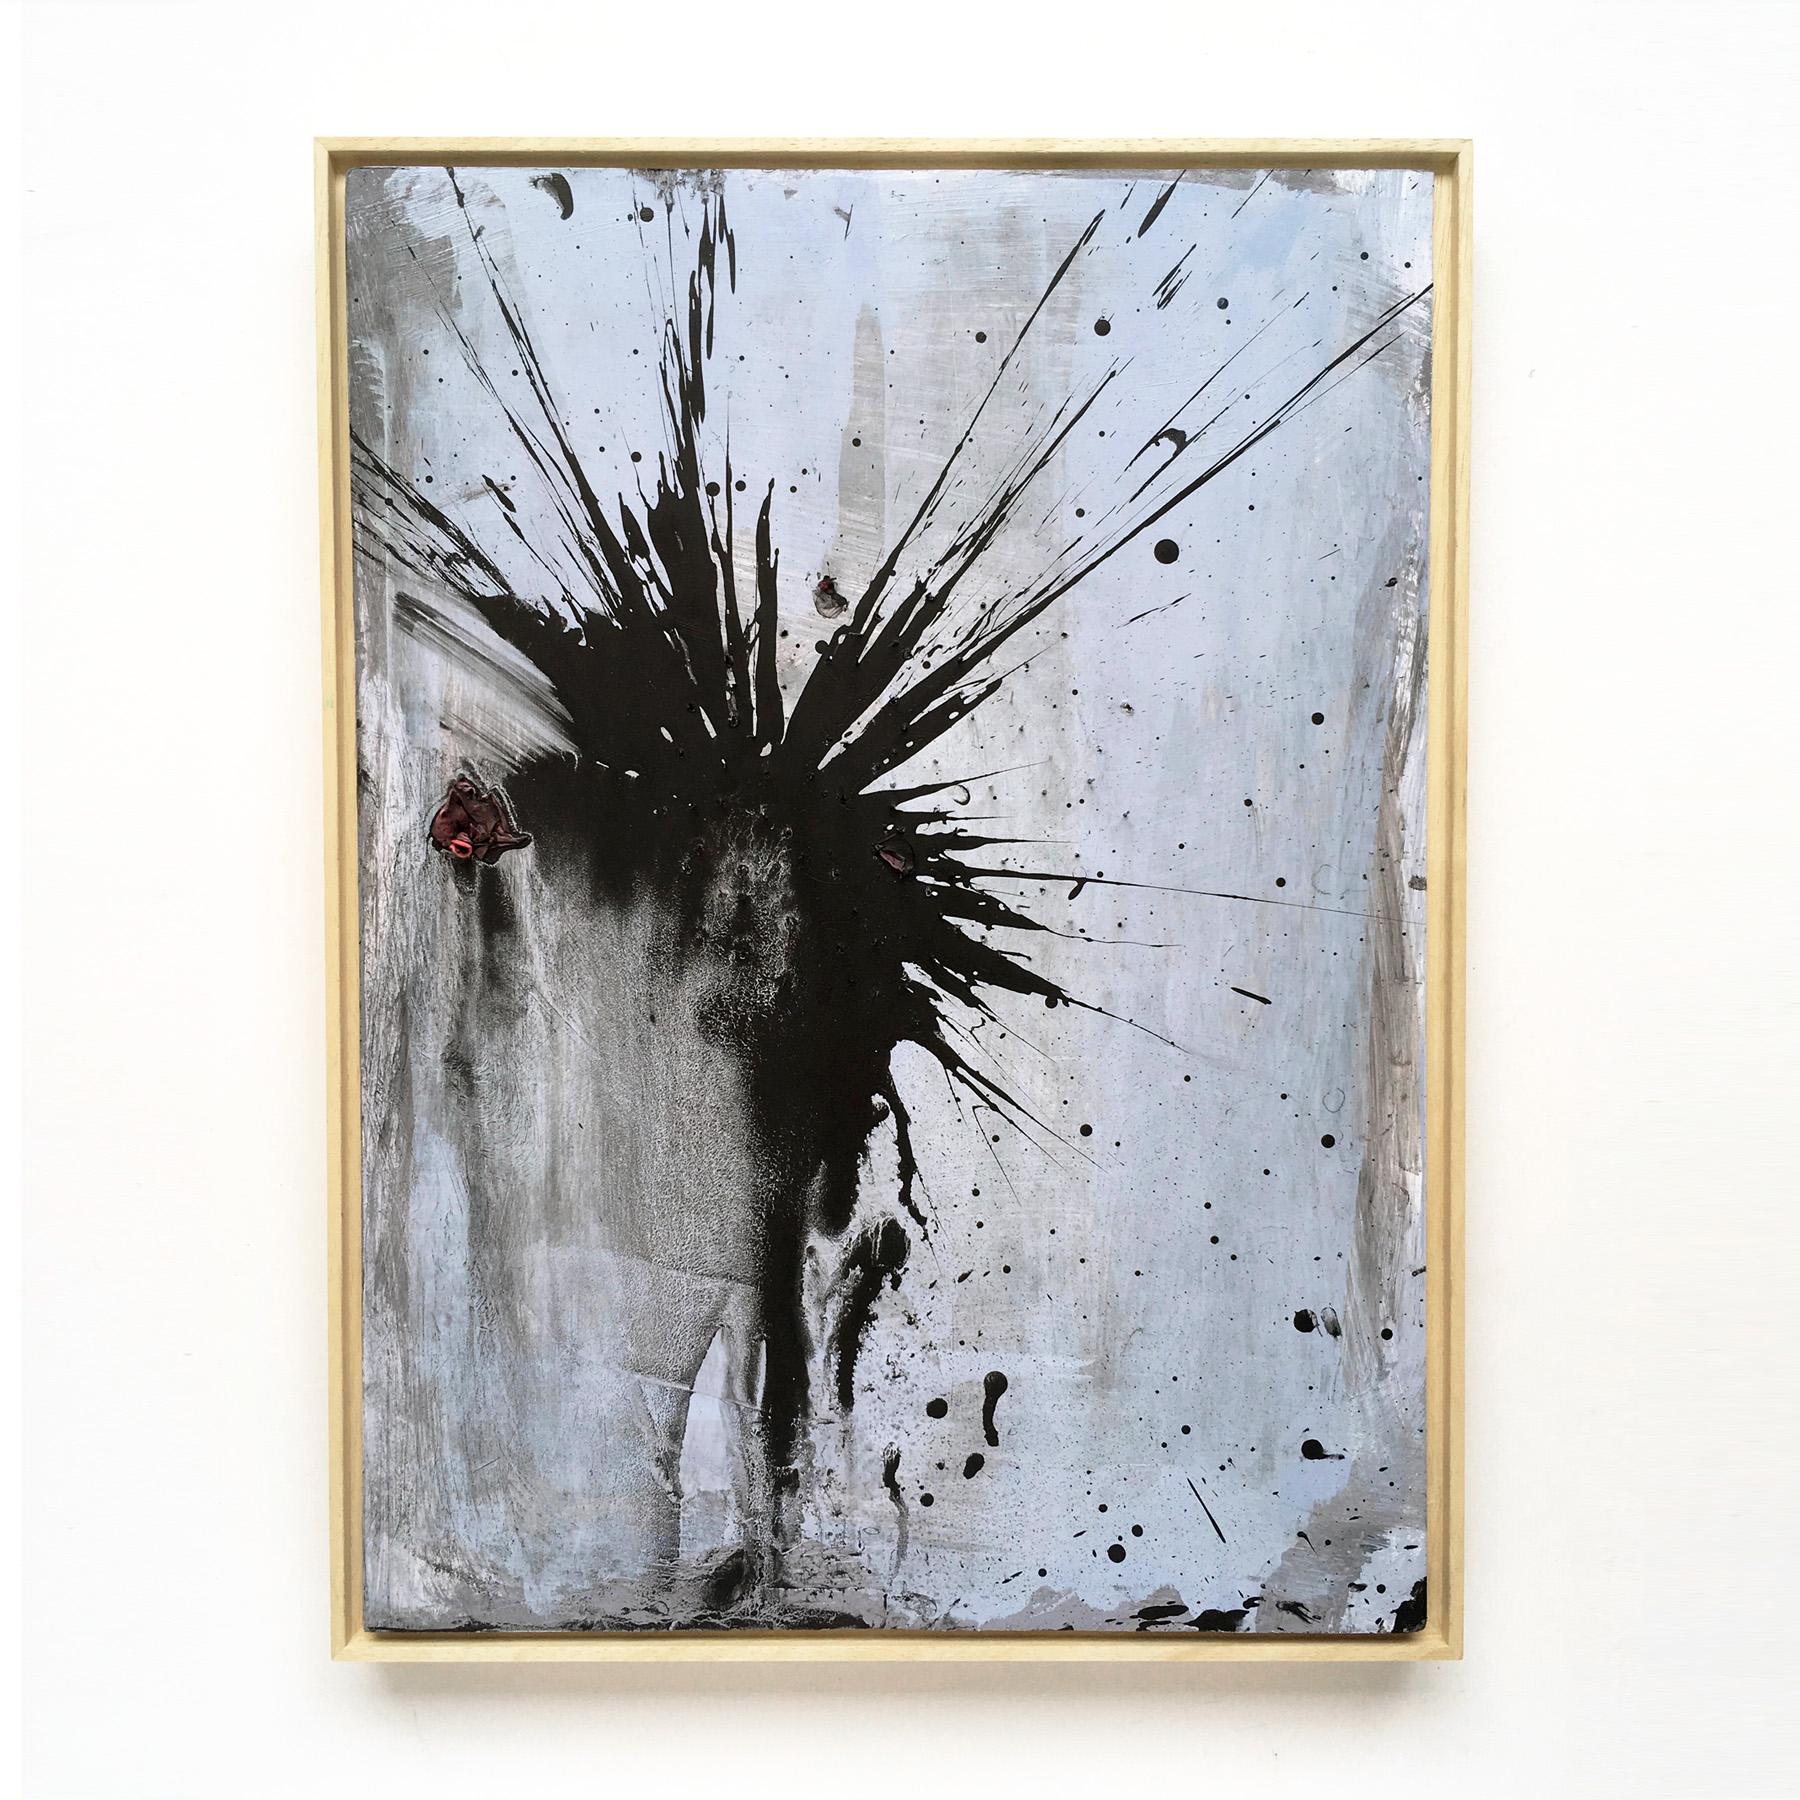 003 - Mike Edwards - Black Firework Painting 160919 (40x30cm).jpg